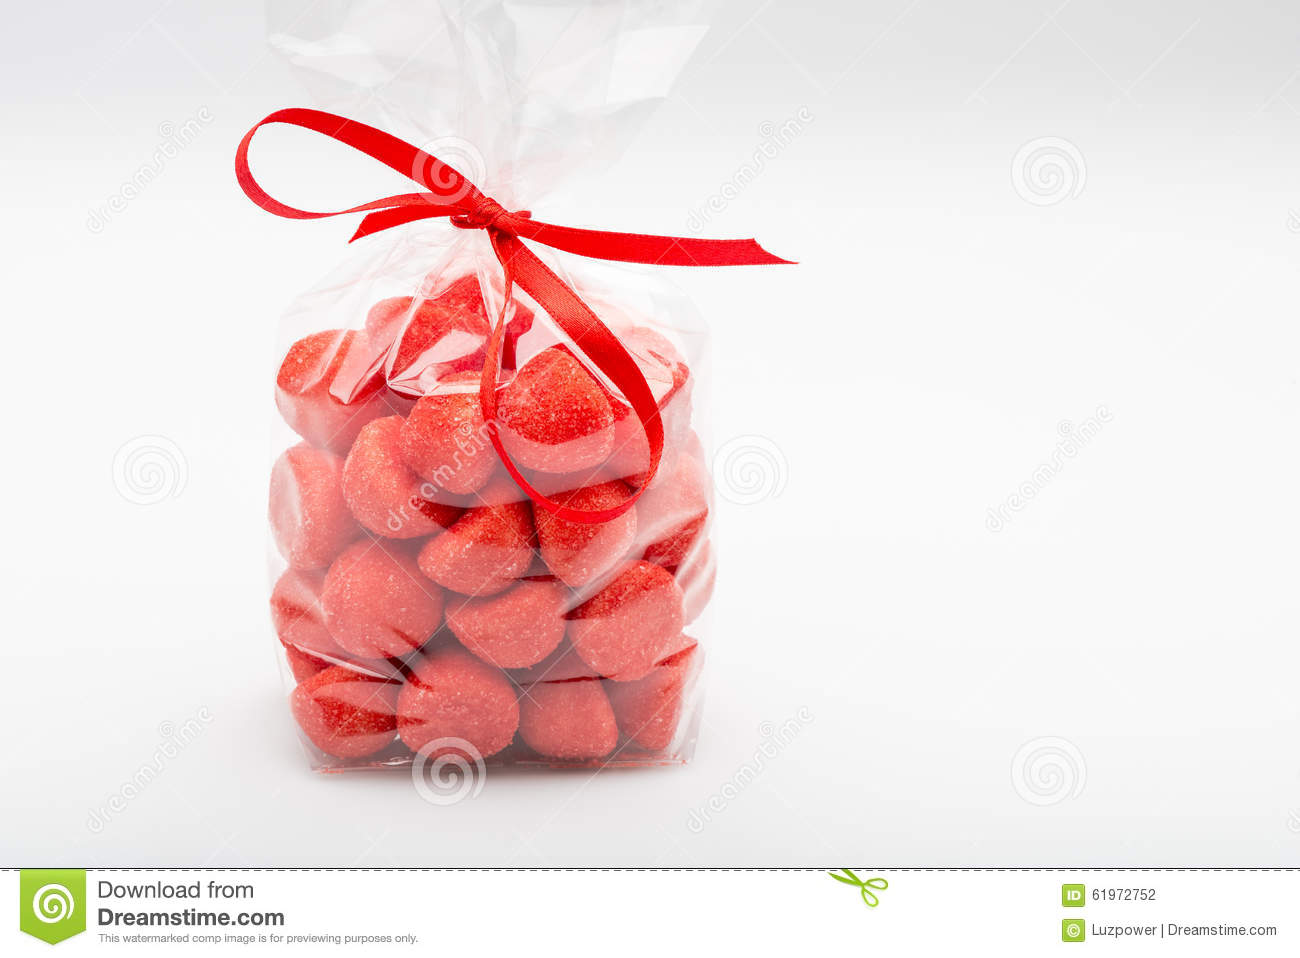 Plastic Bag Of Acidulous Strawberries Isolated With Elegant Red.